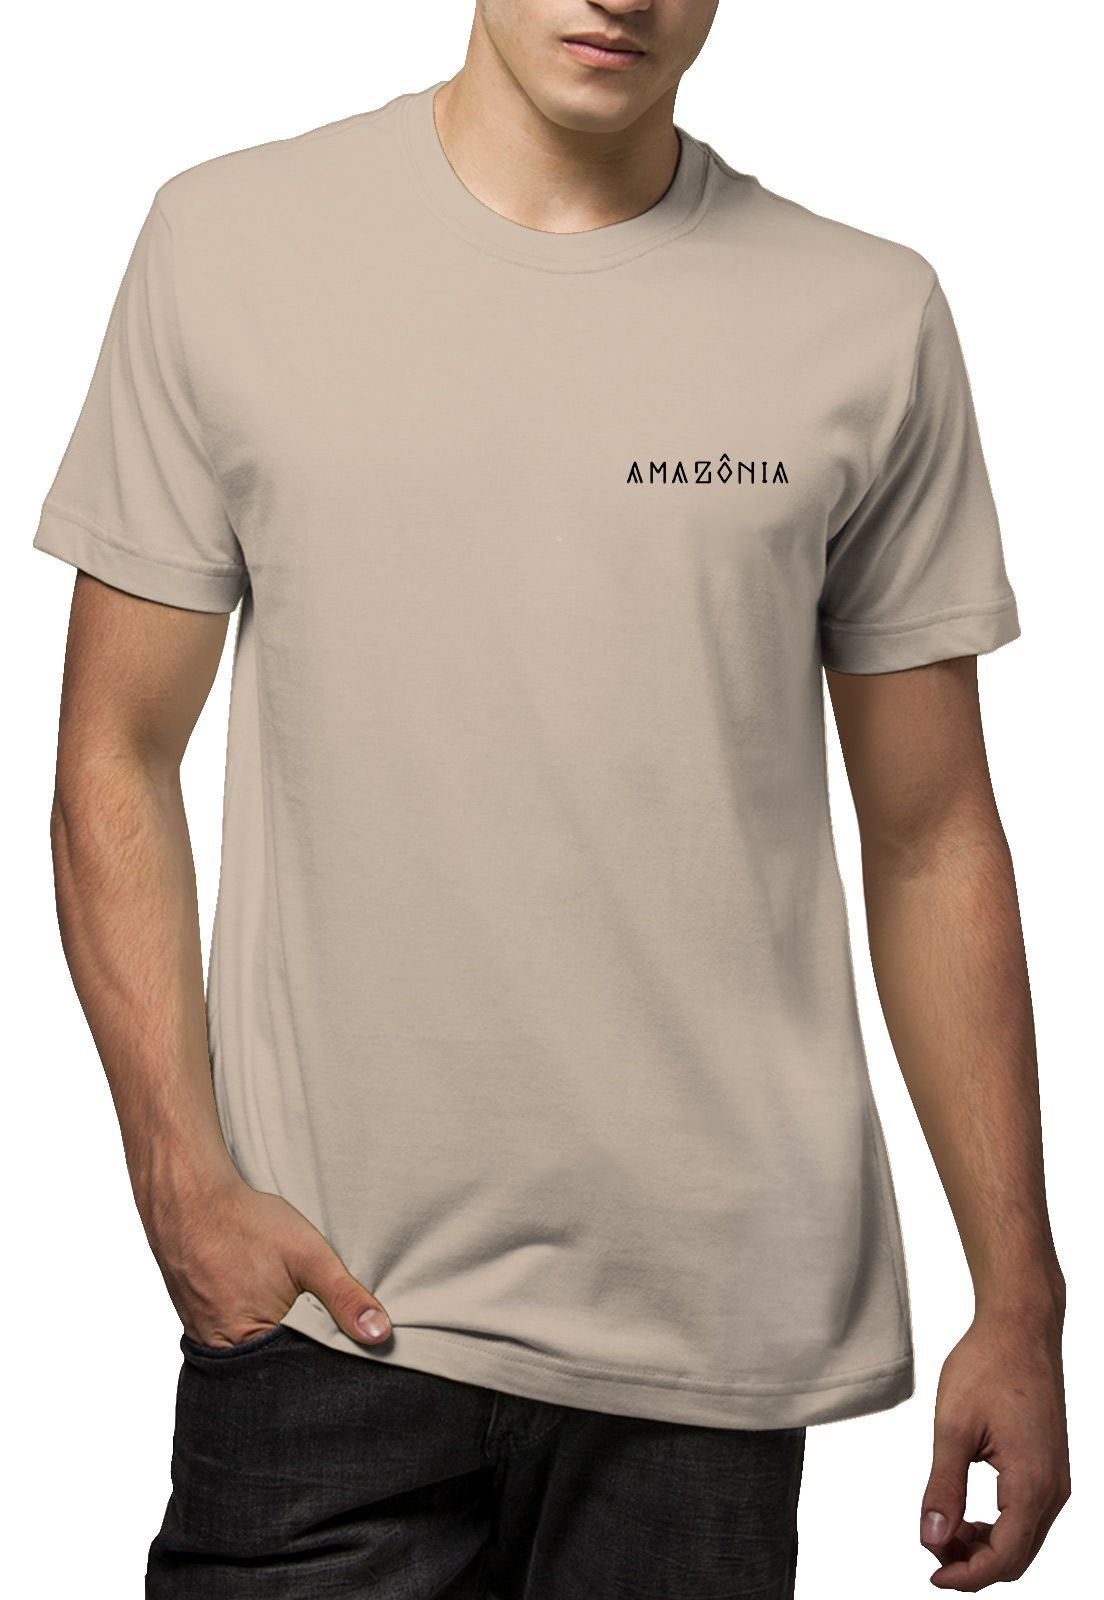 Camiseta Amazônia Cocar Indígena - Bege